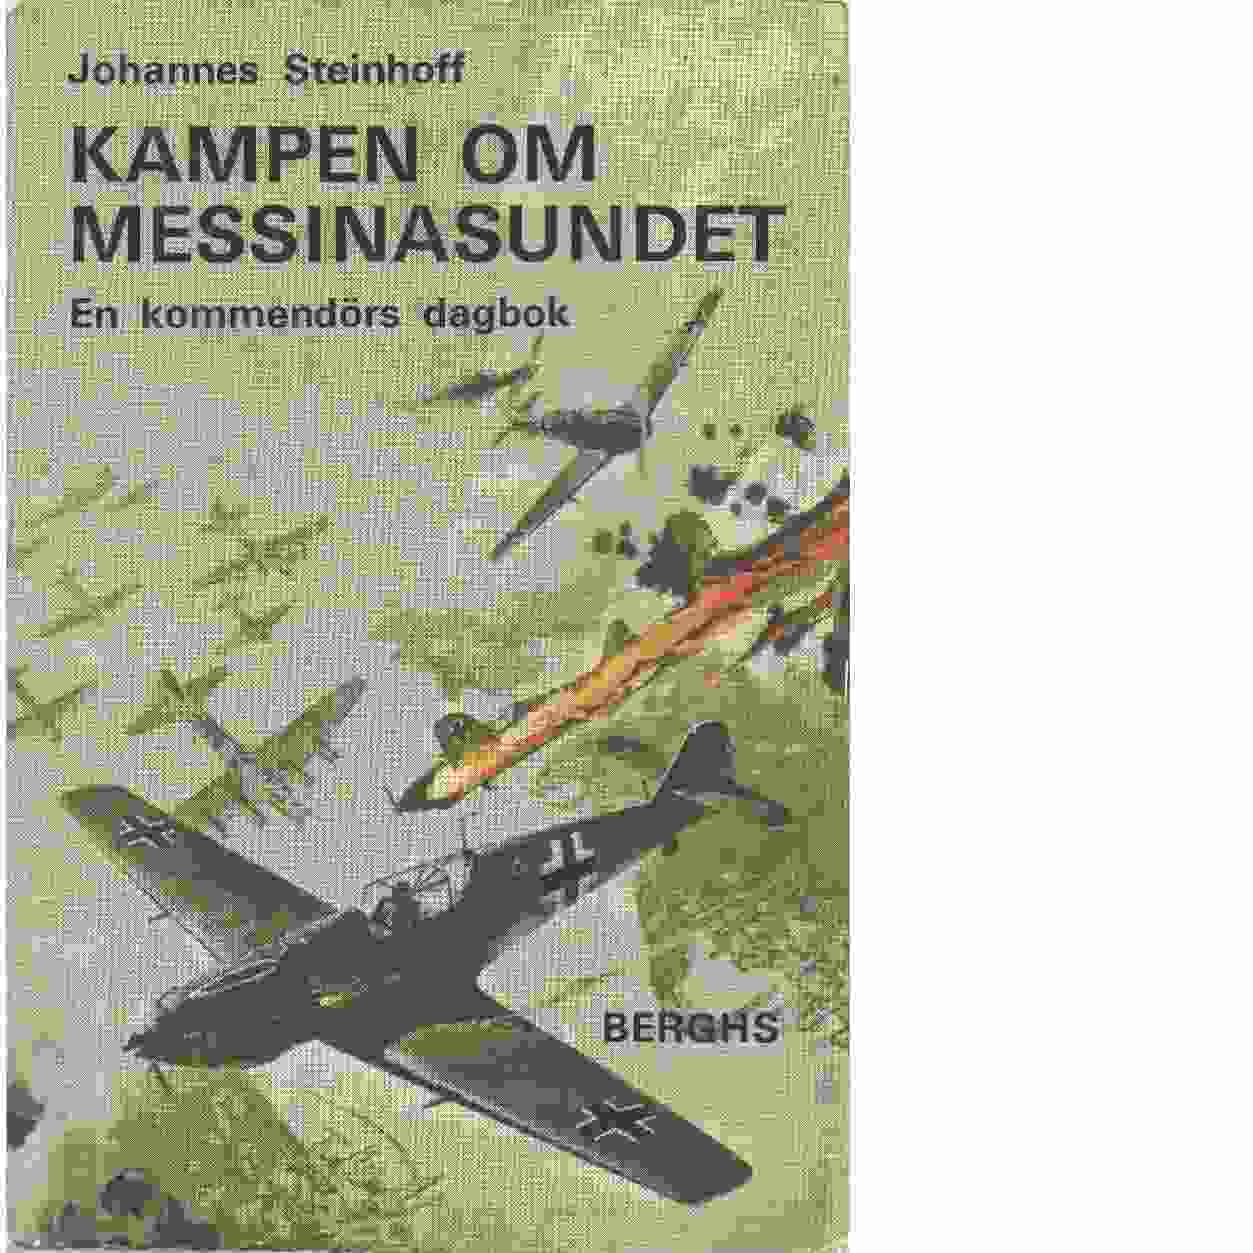 Kampen om Messinasundet : en kommendörs dagbok - Steinhoff, Johannes